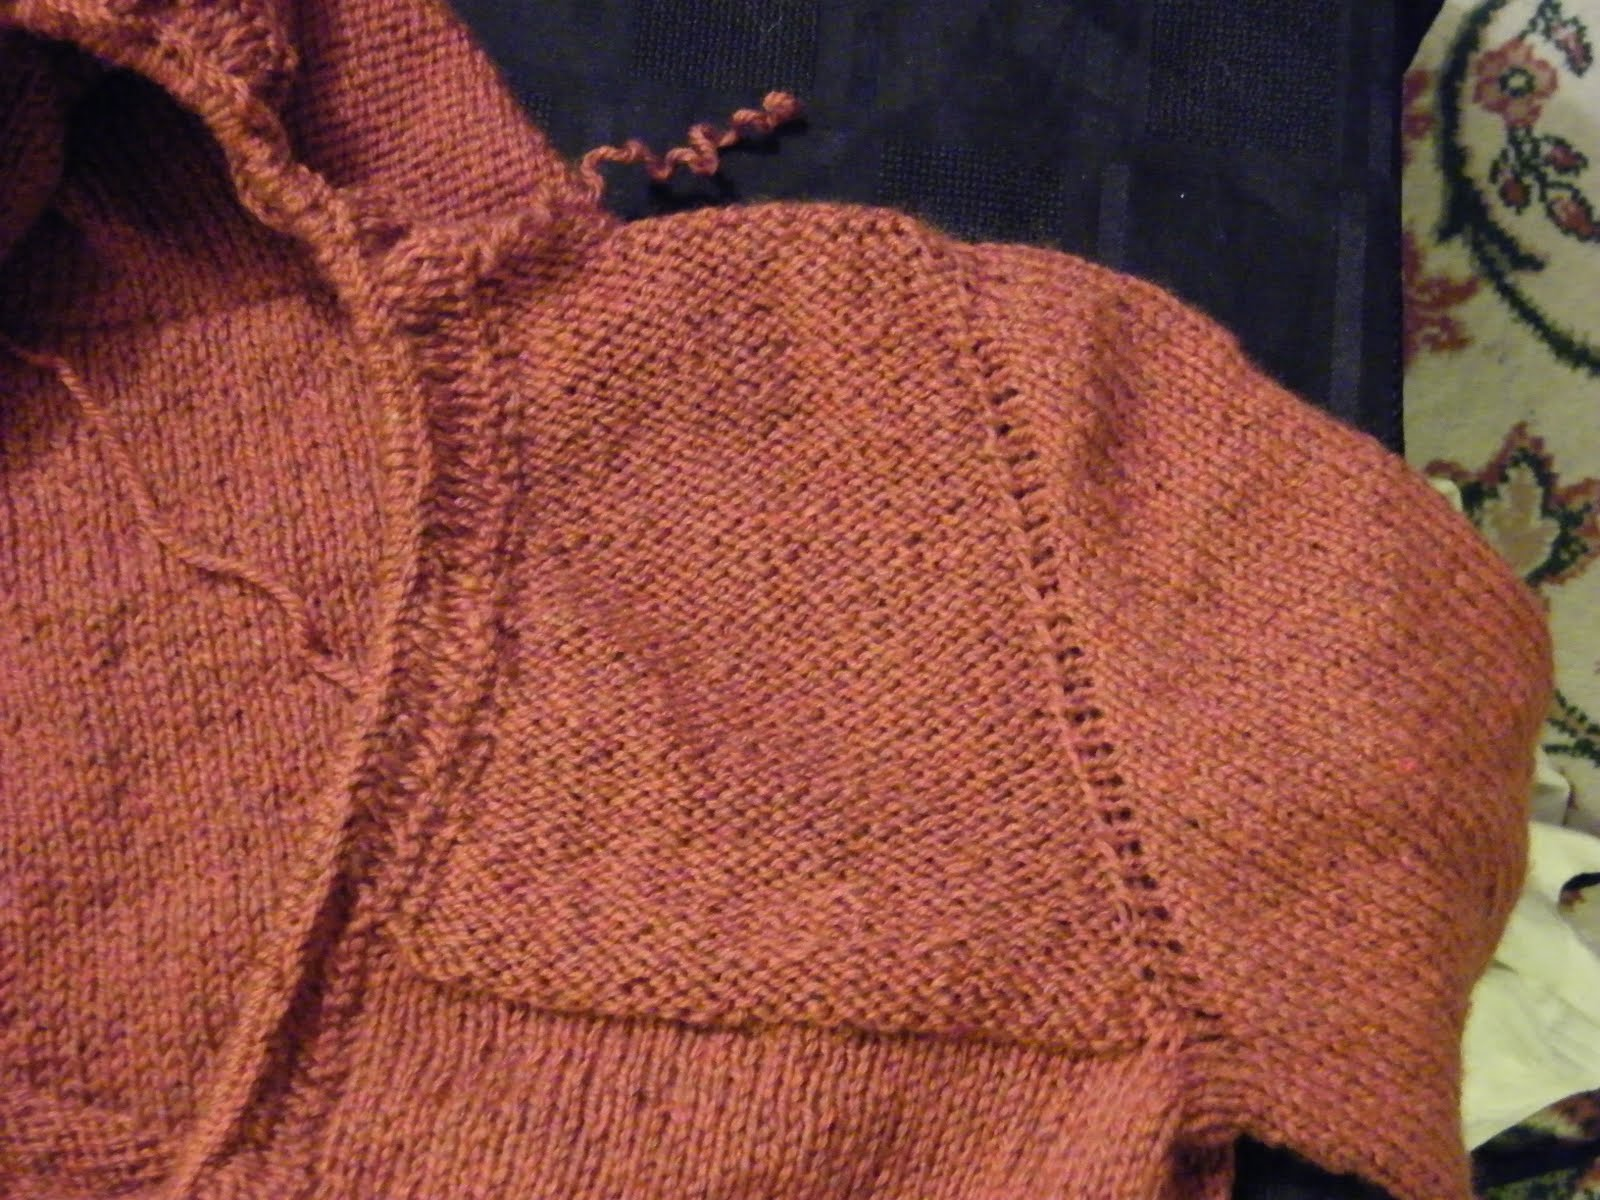 Knitting Picking Up Stitches Evenly : Yarndancer: Double Garter - The Devils Stitch?!?